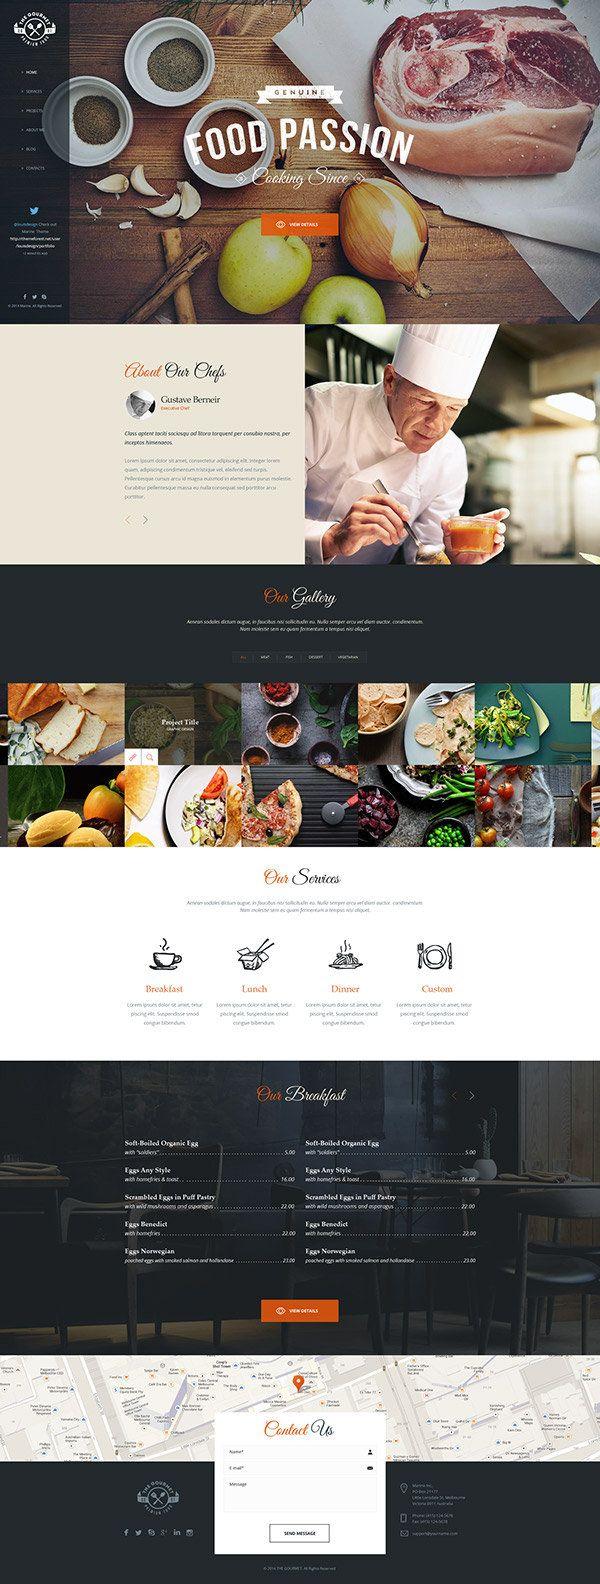 The Gourmet – Food WP Skin & Theme — Designspiration